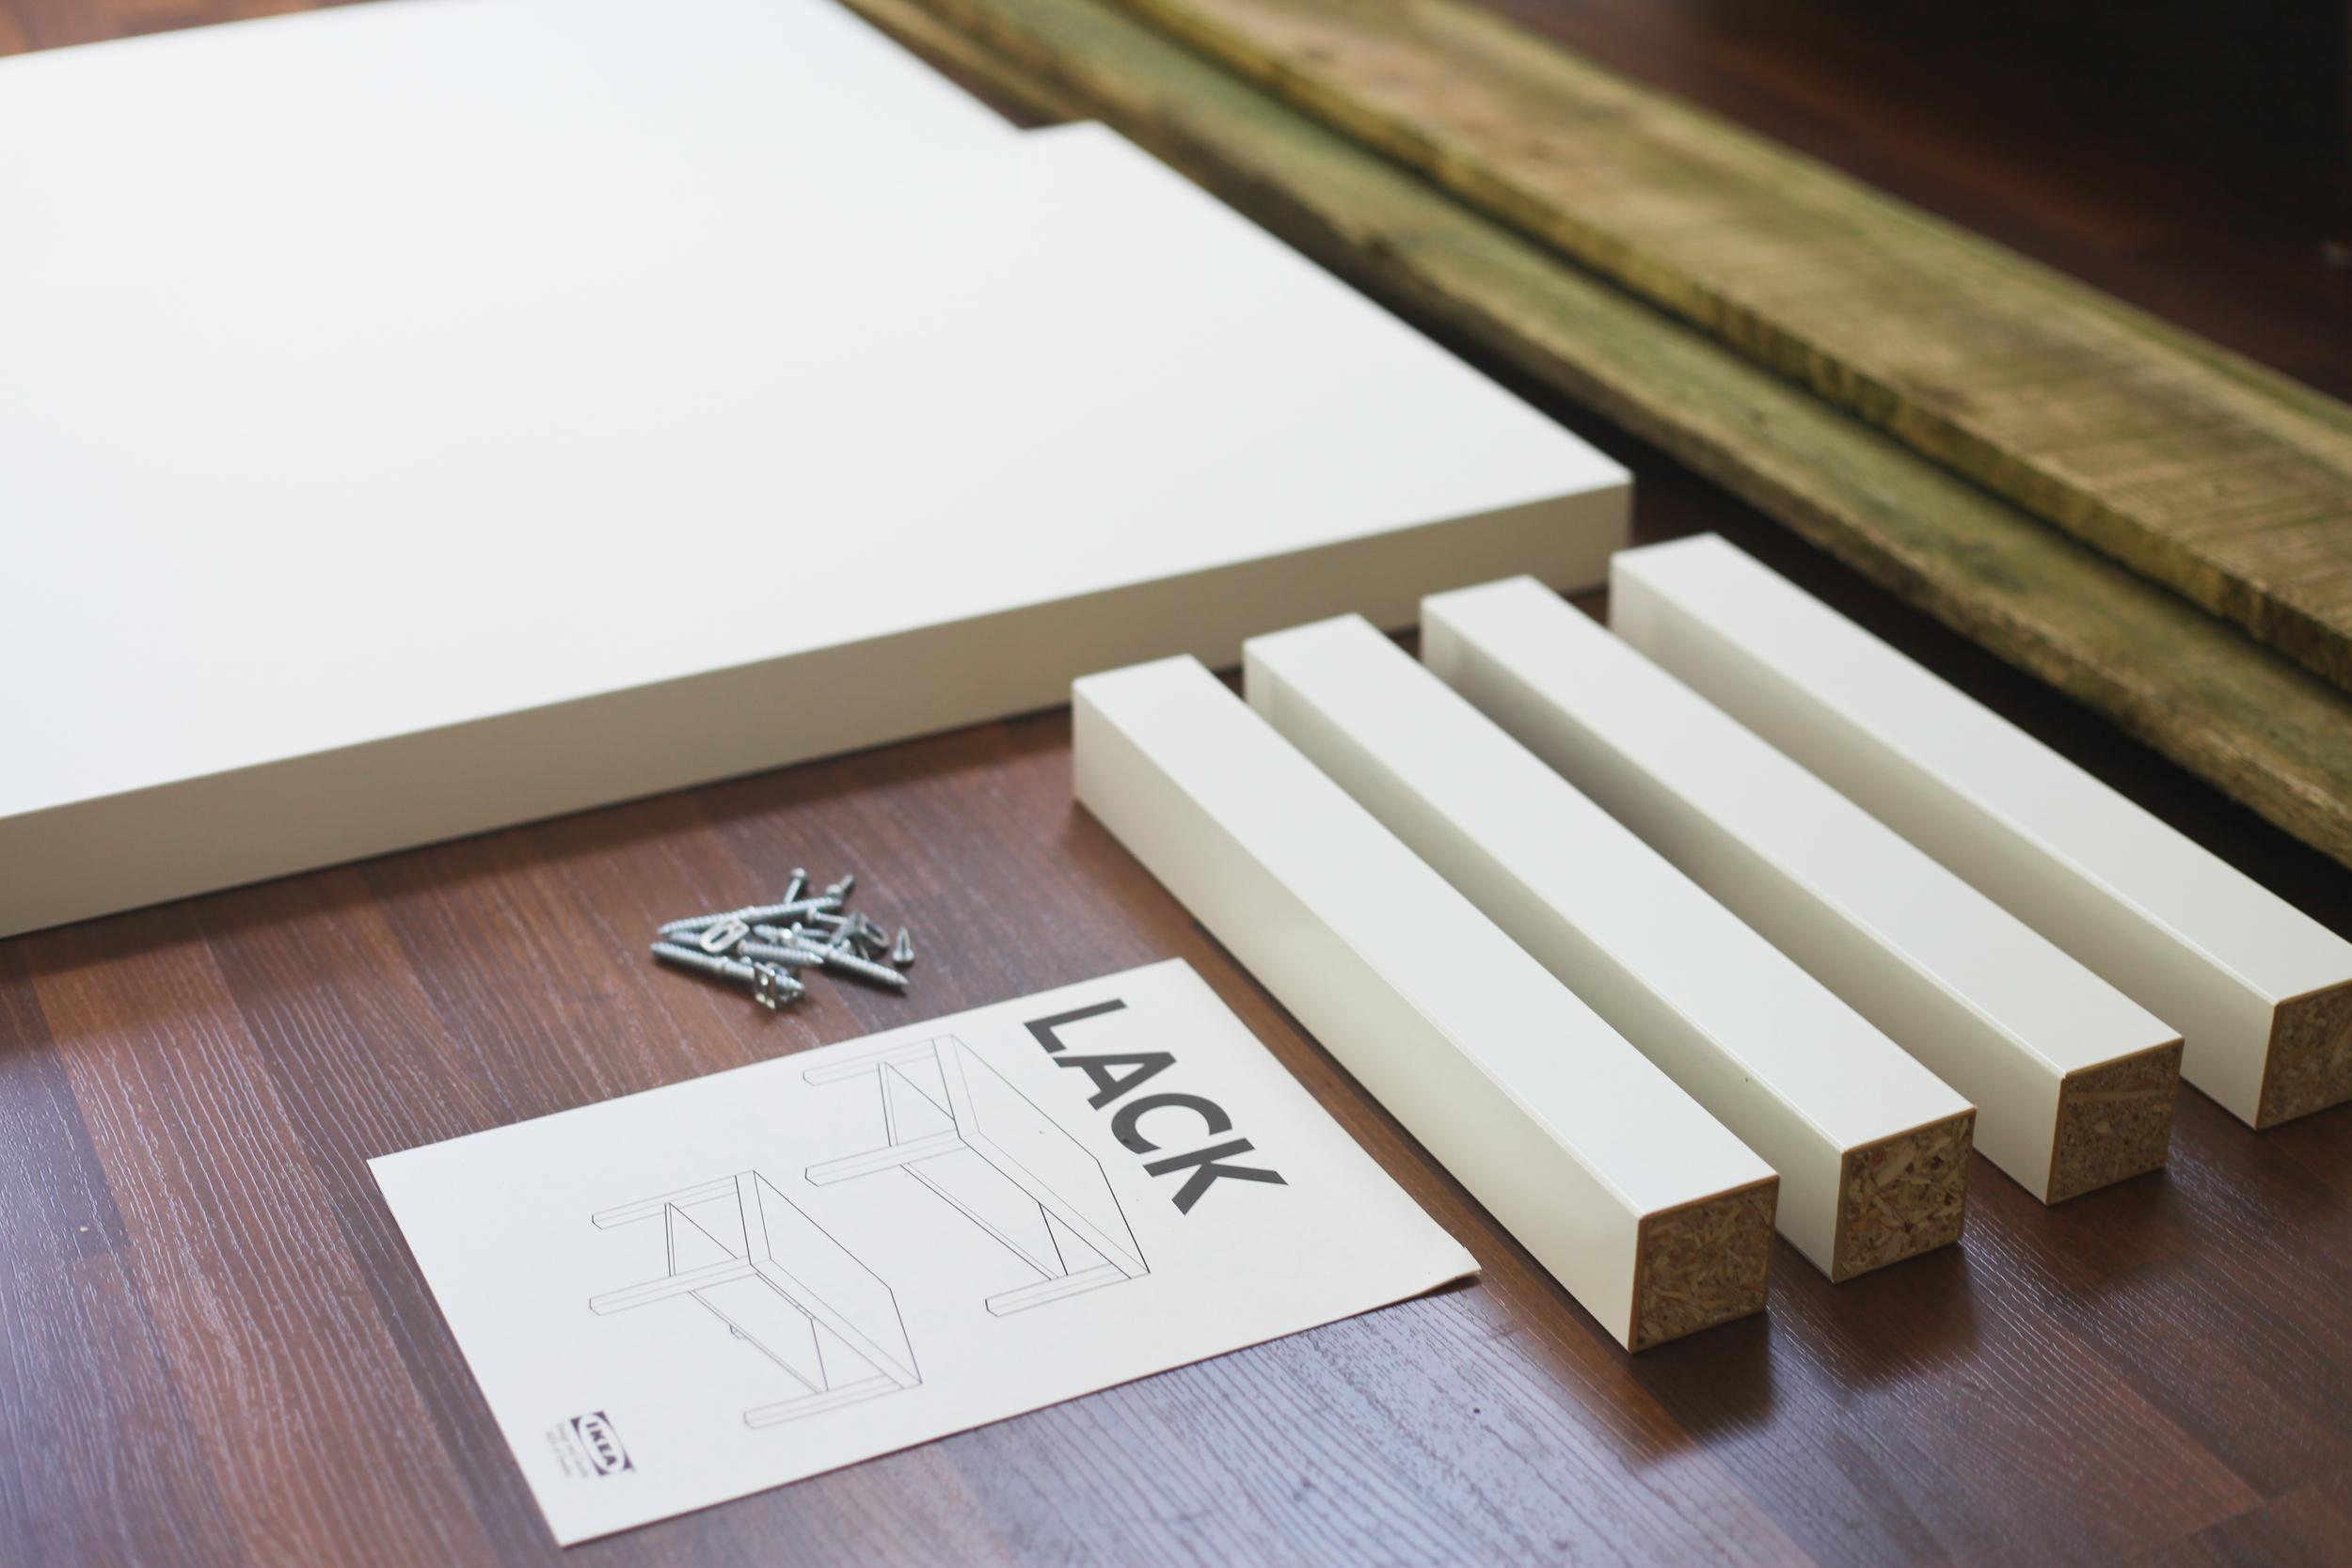 Ikea Hacks 3 Easy Steps To Create Your Own Ikea Coffee Table Treasures Travels